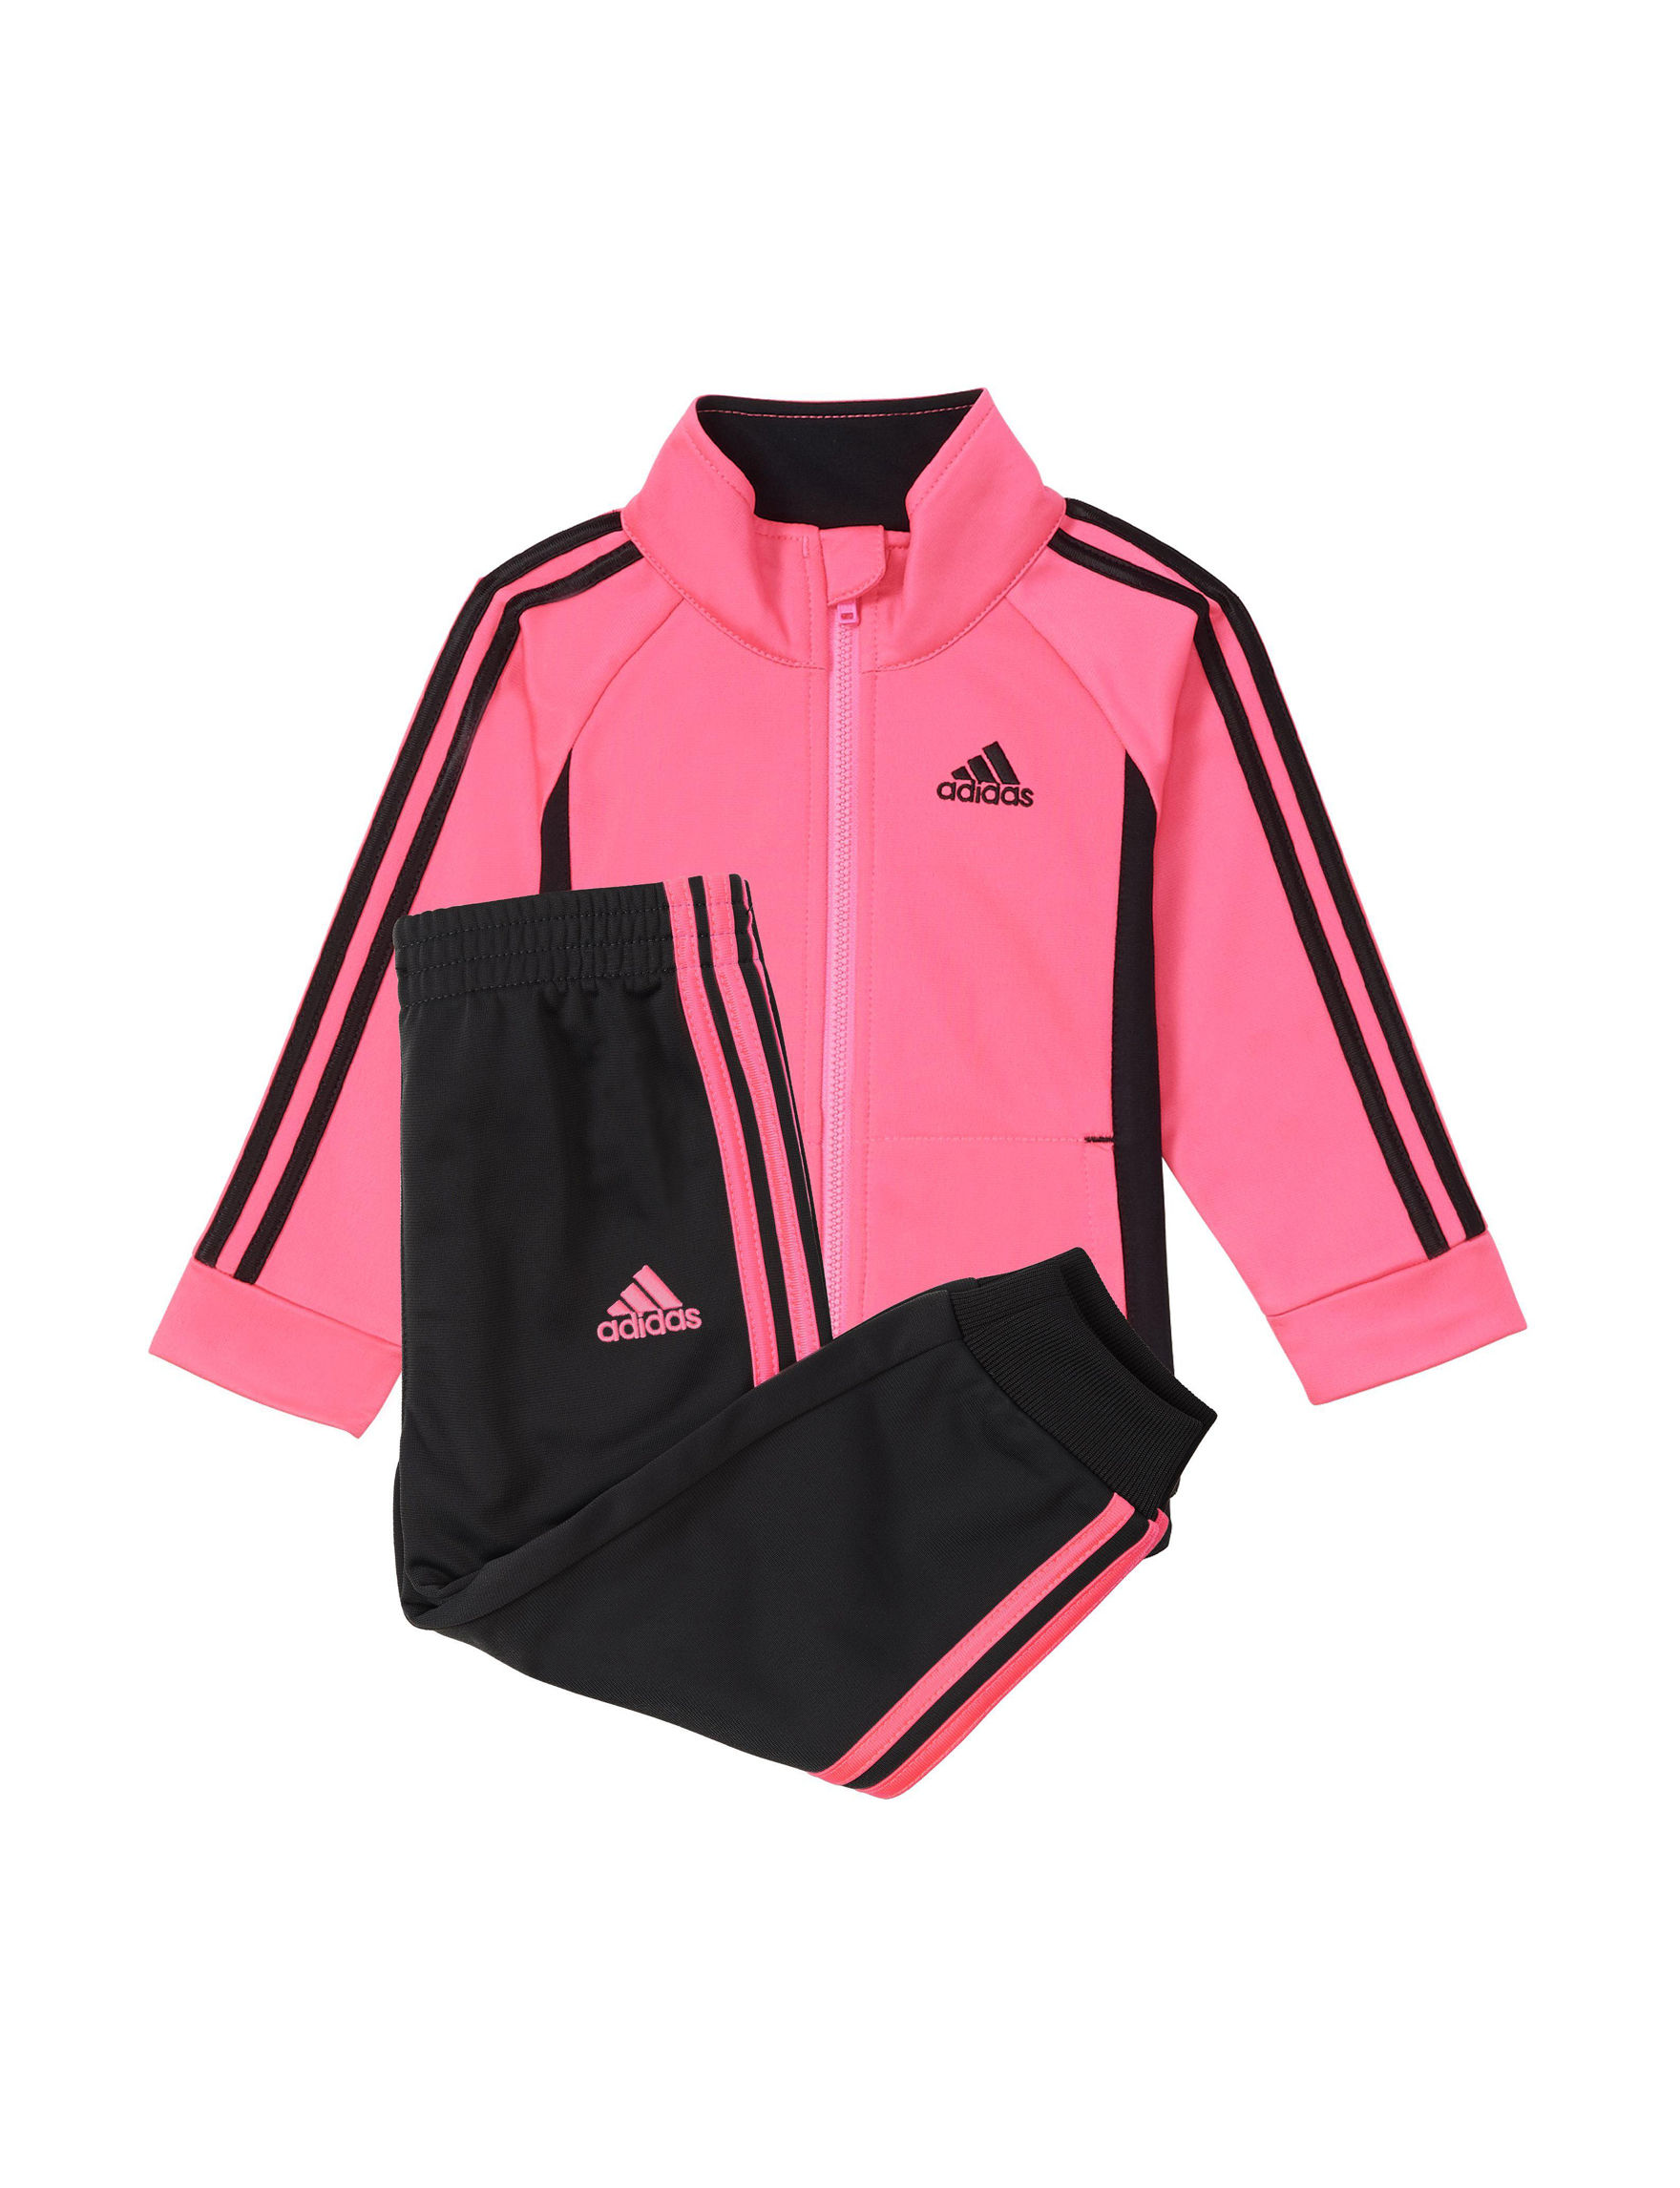 Adidas Bright Pink